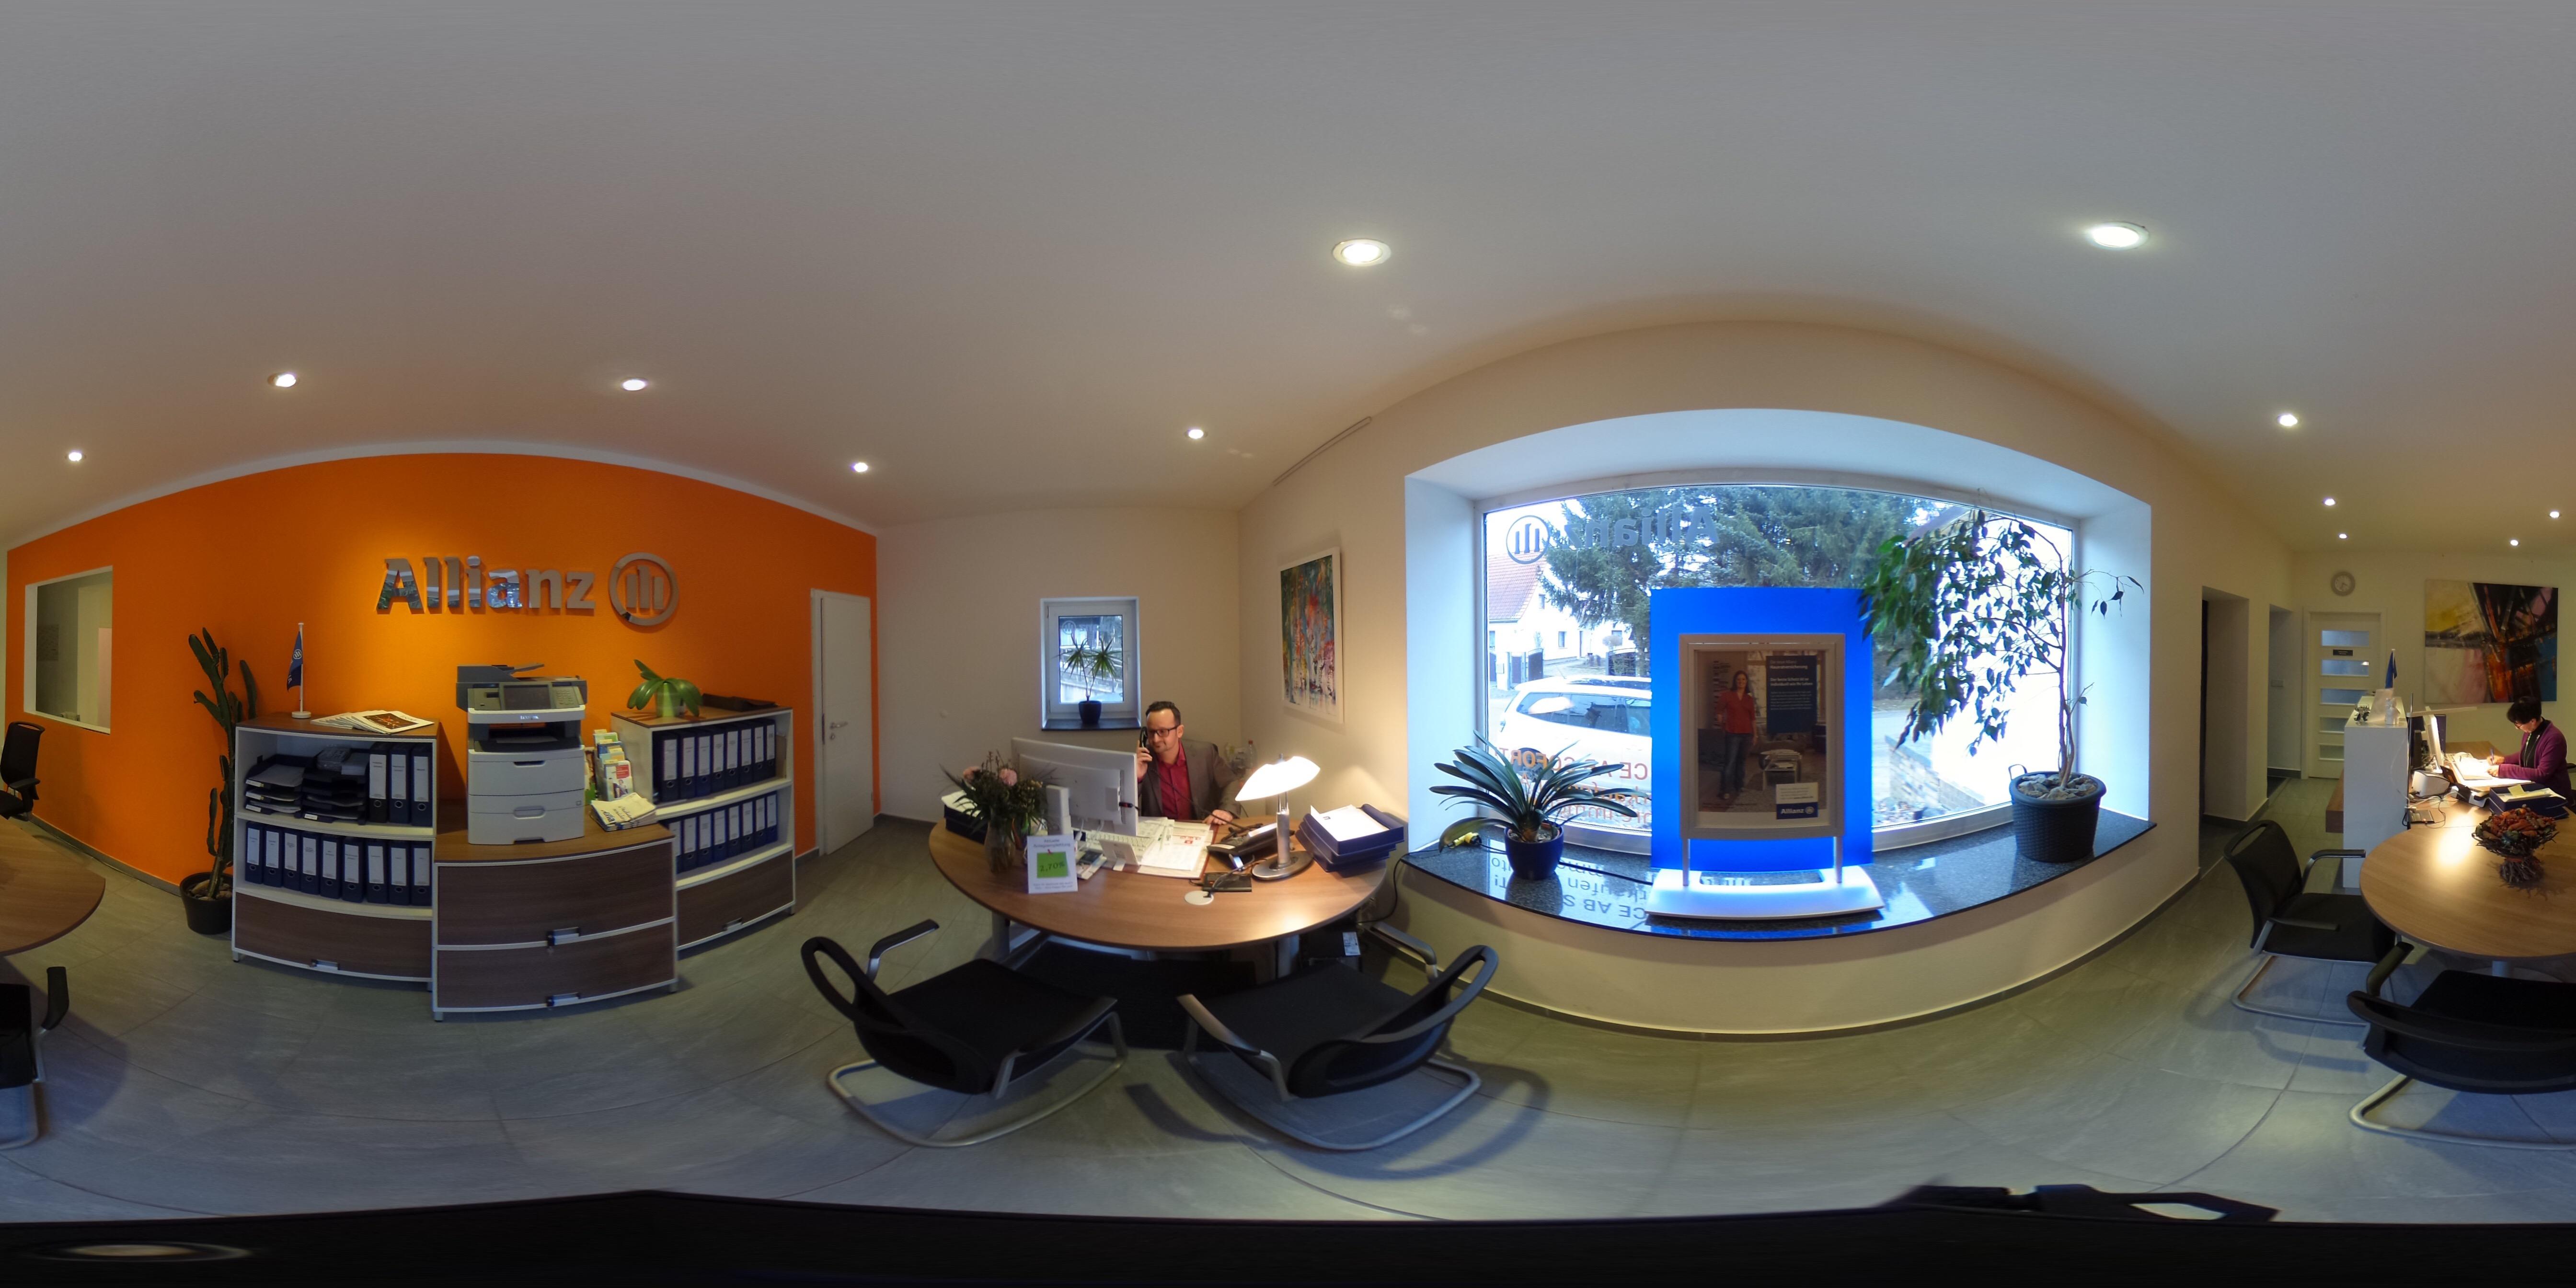 allianz versicherung norbert gentsch hauptvertretung. Black Bedroom Furniture Sets. Home Design Ideas